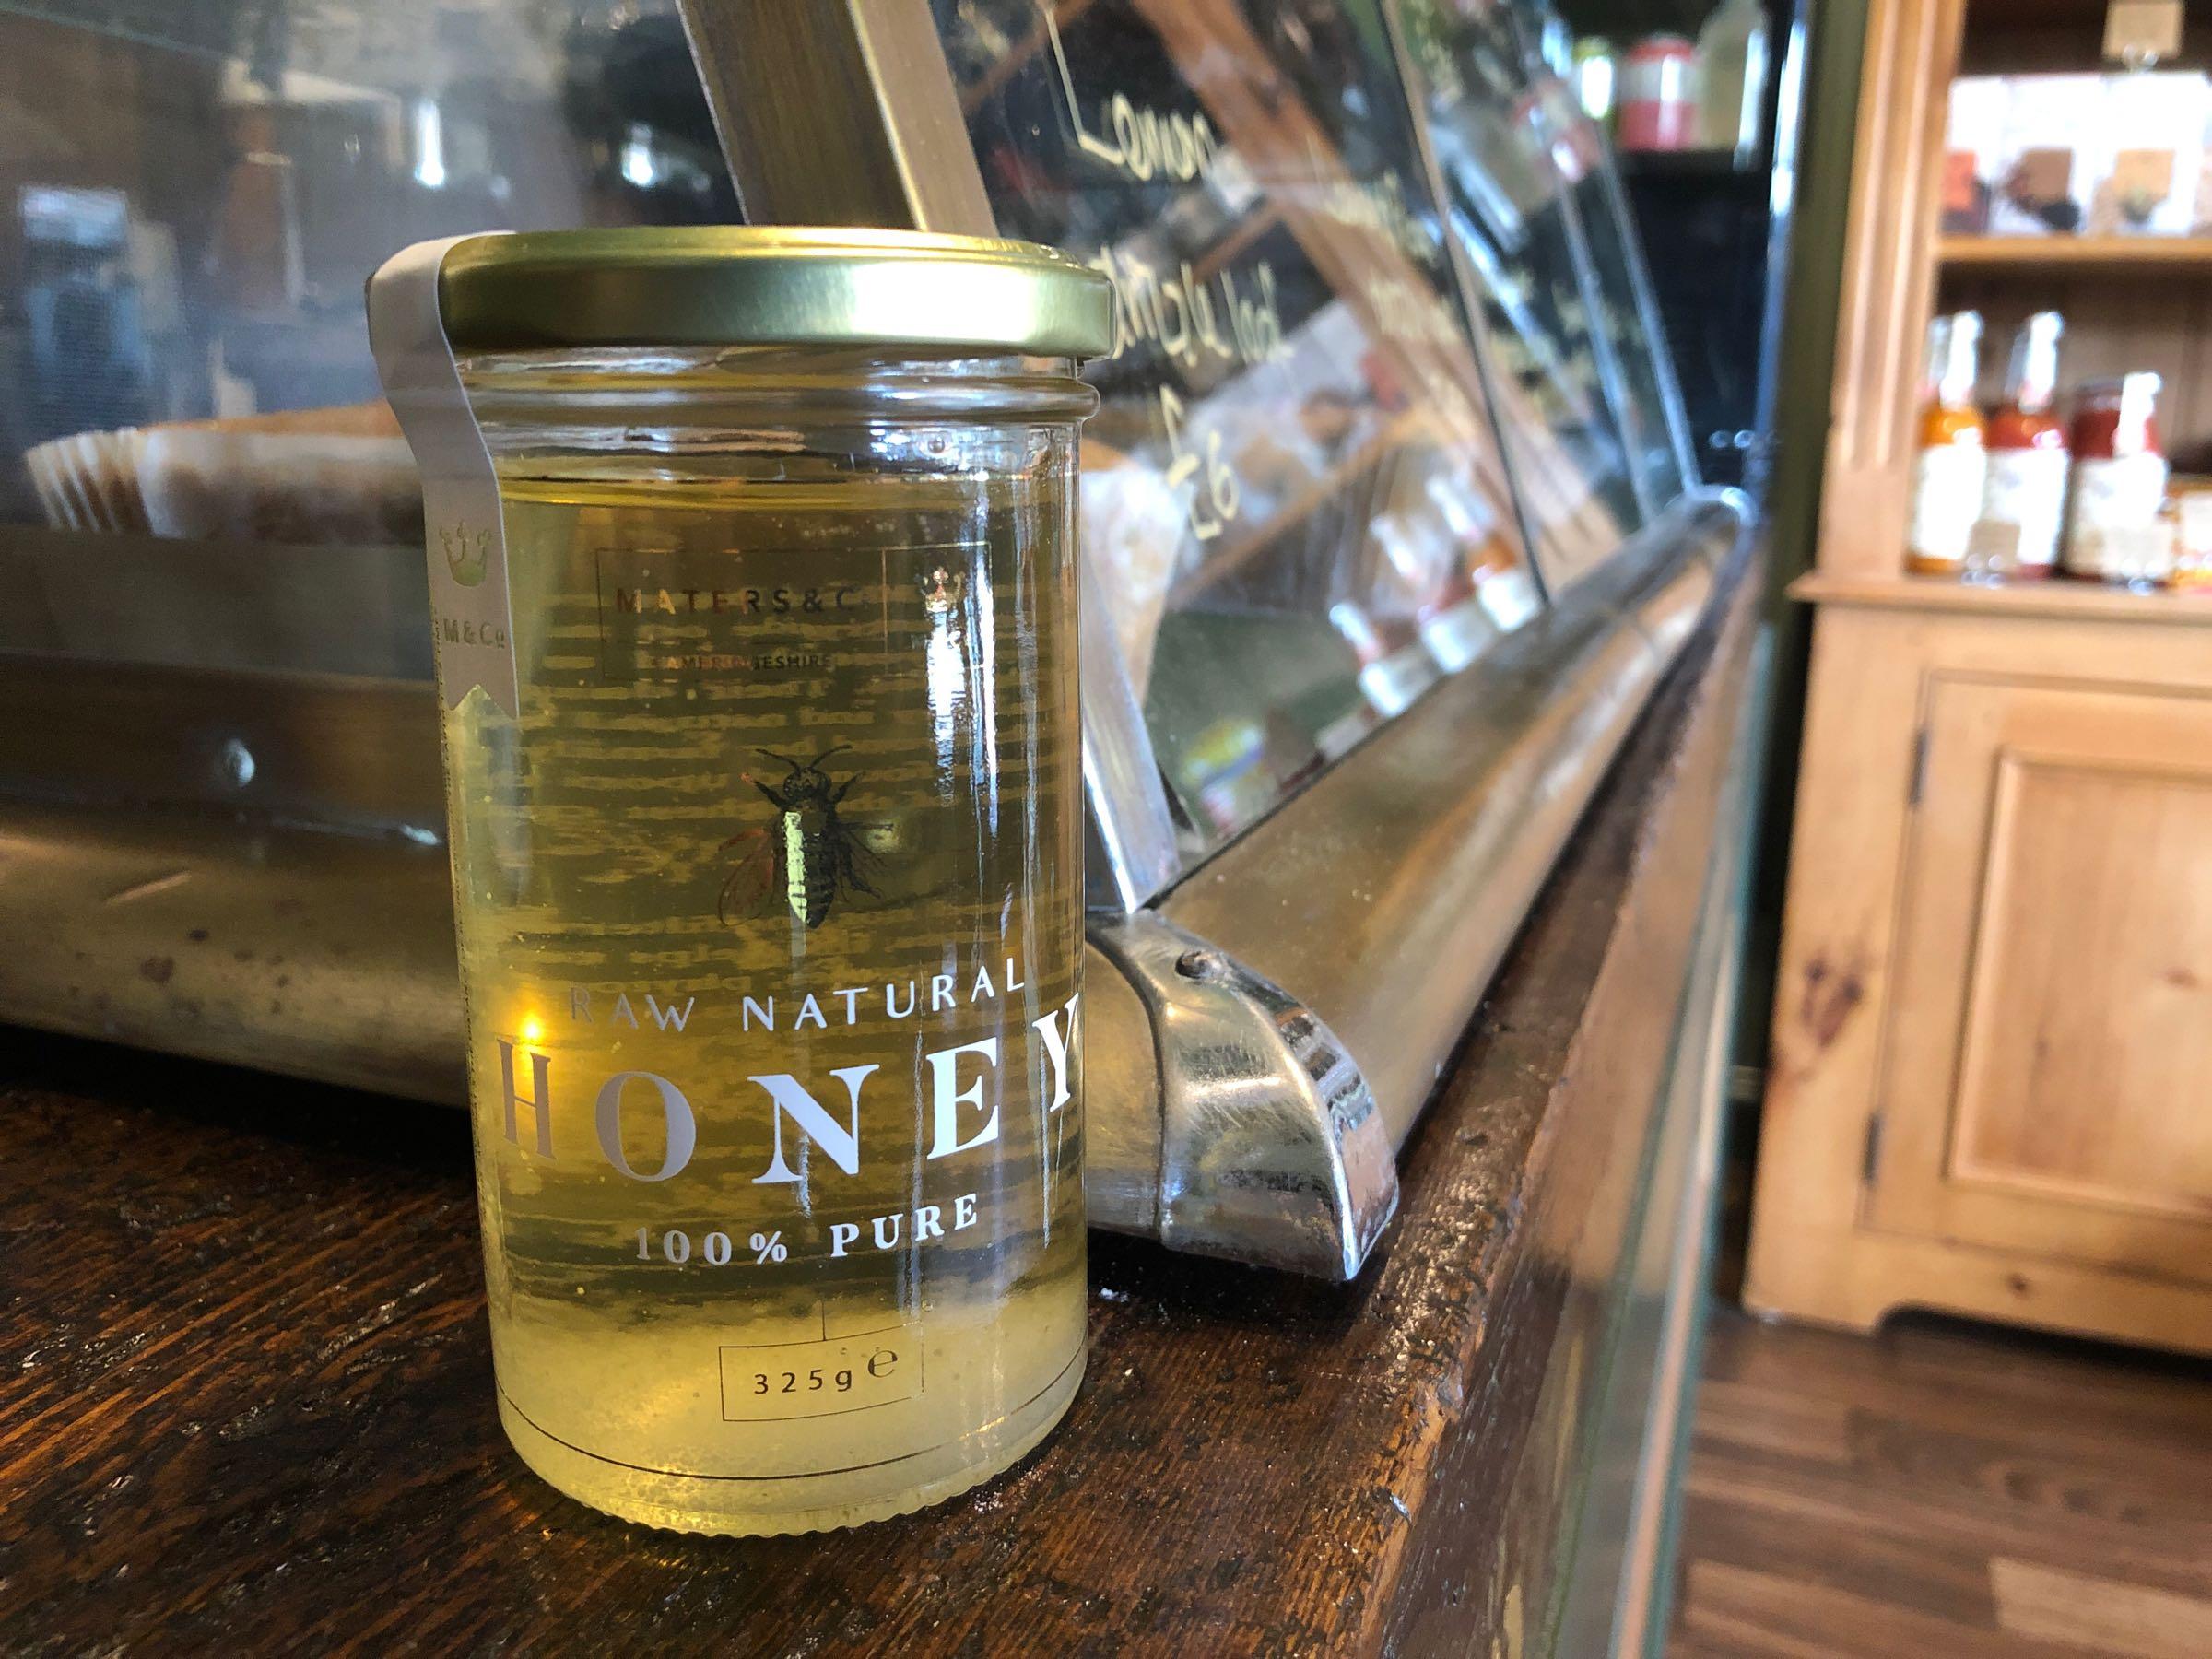 Maters & Co Honey 325g - Borage